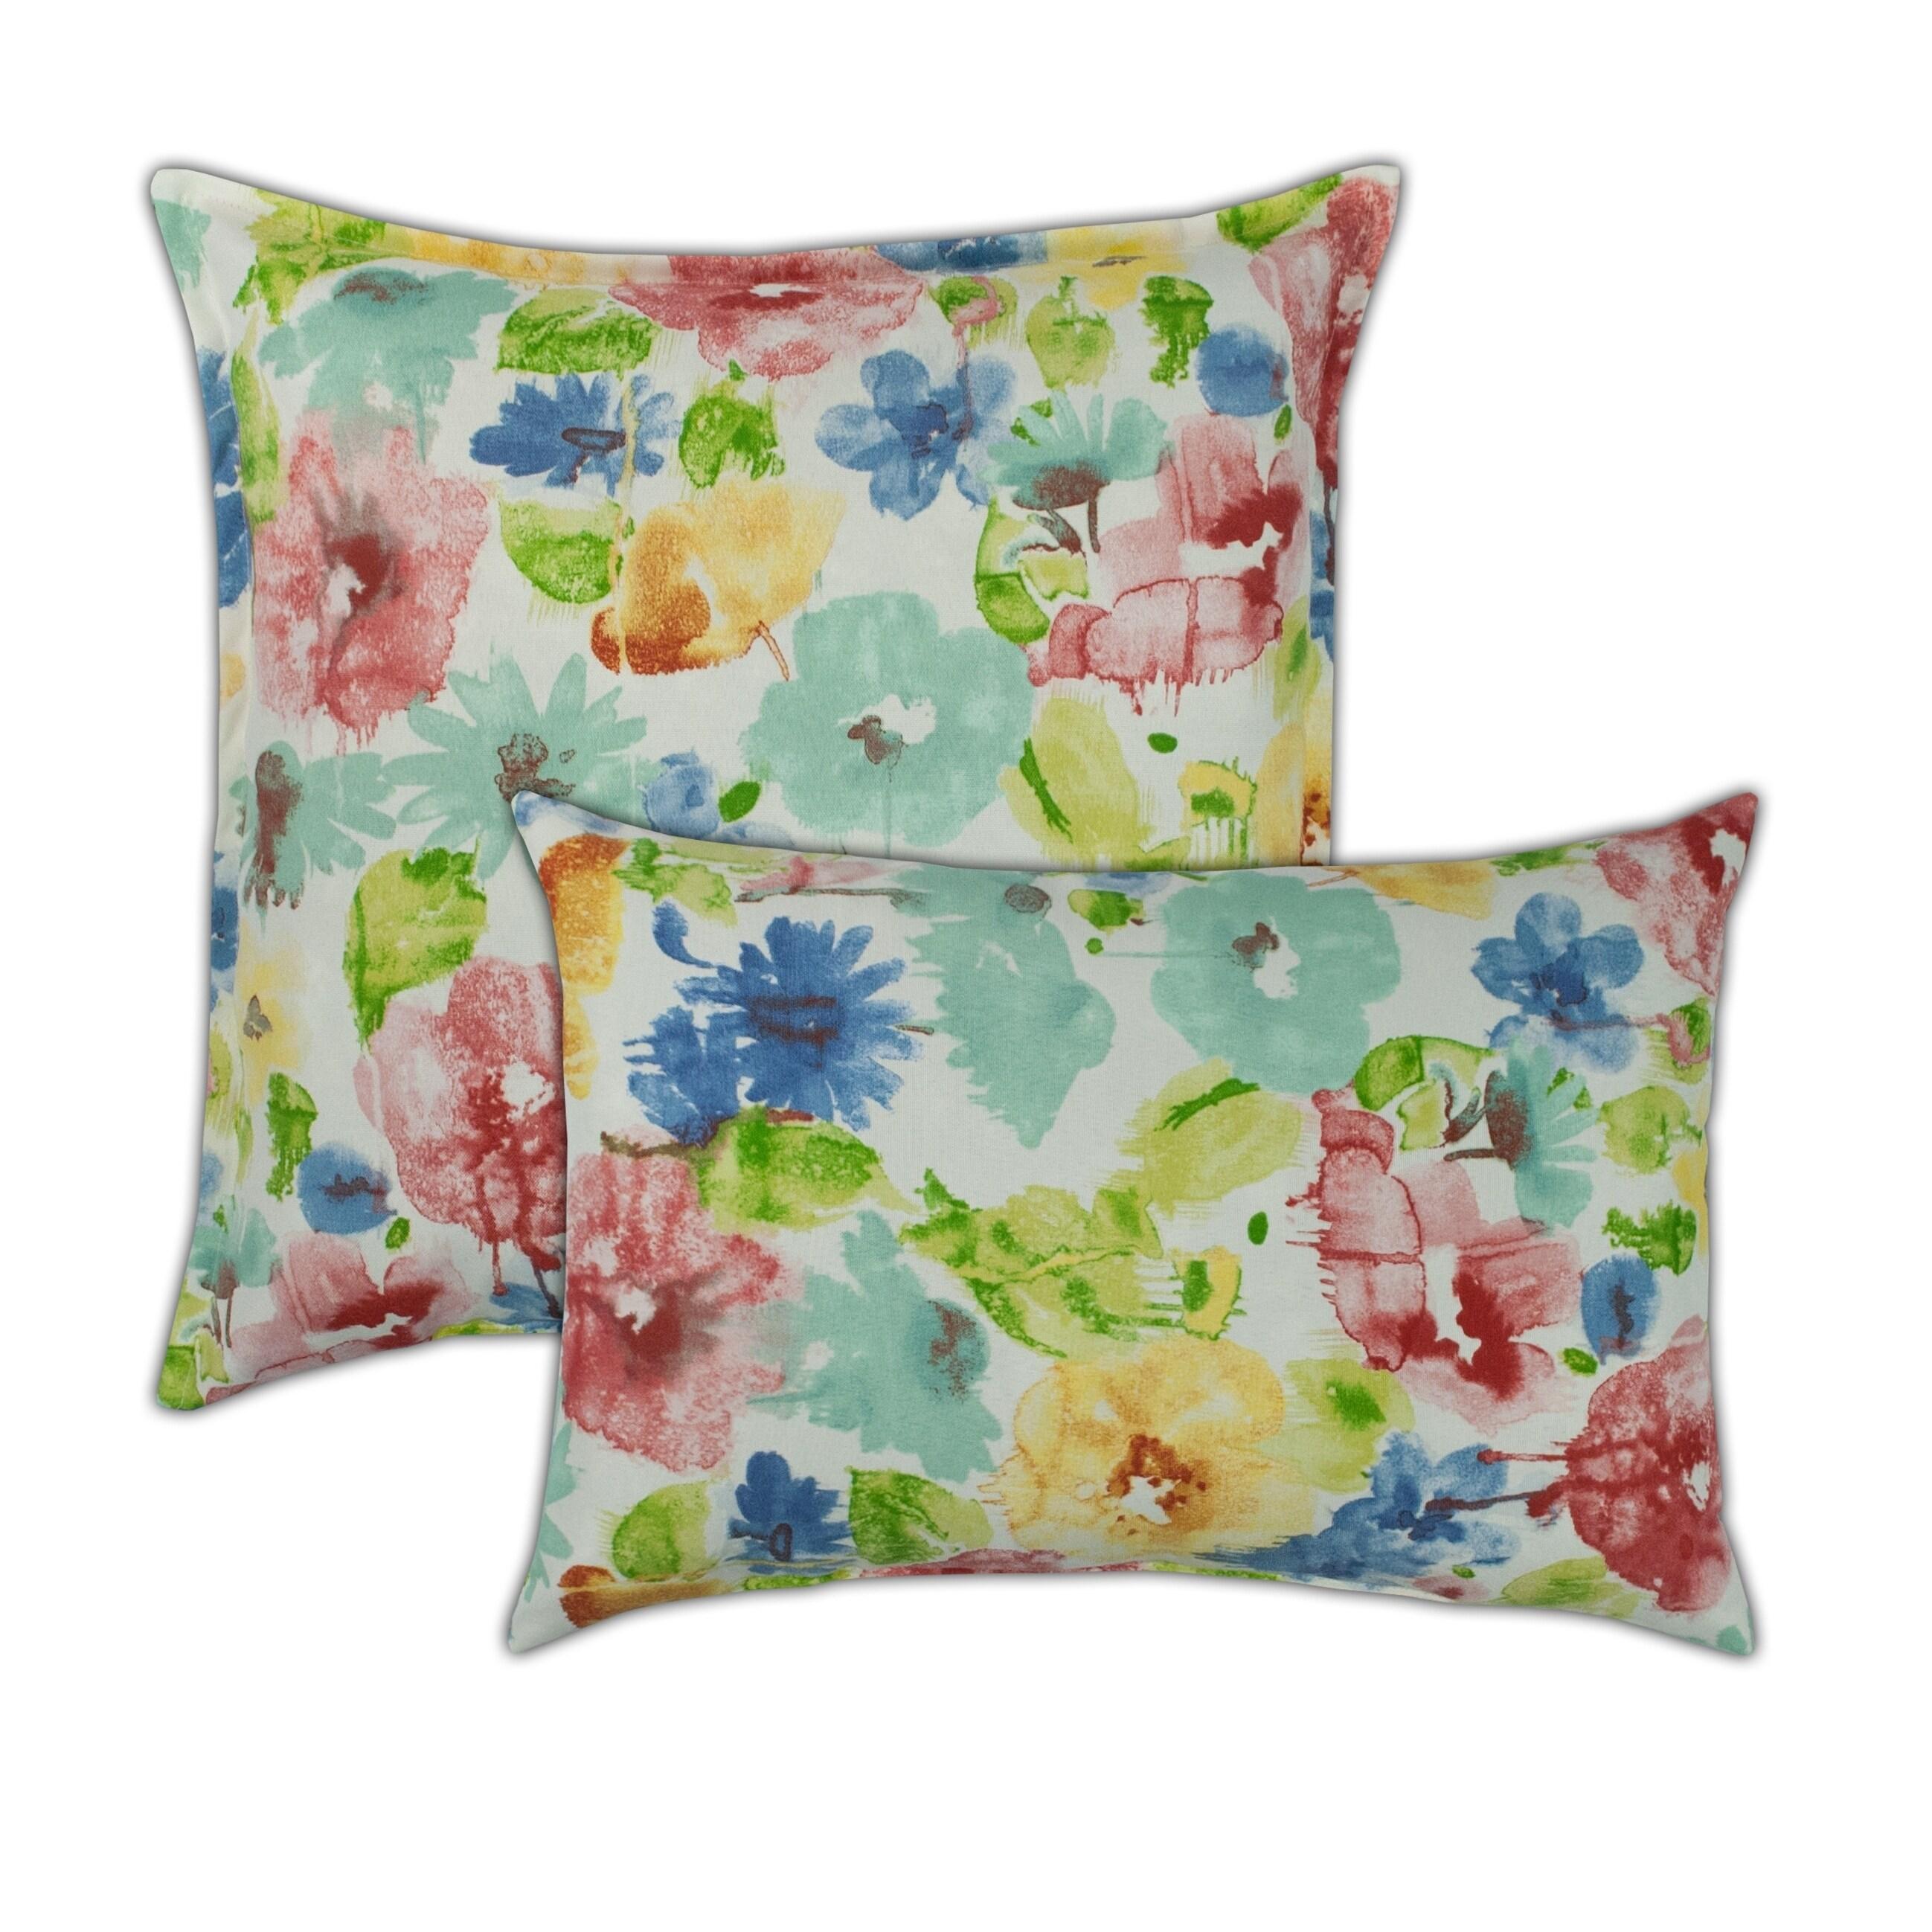 Sherry Kline Alcove White Combo Outdoor Pillows